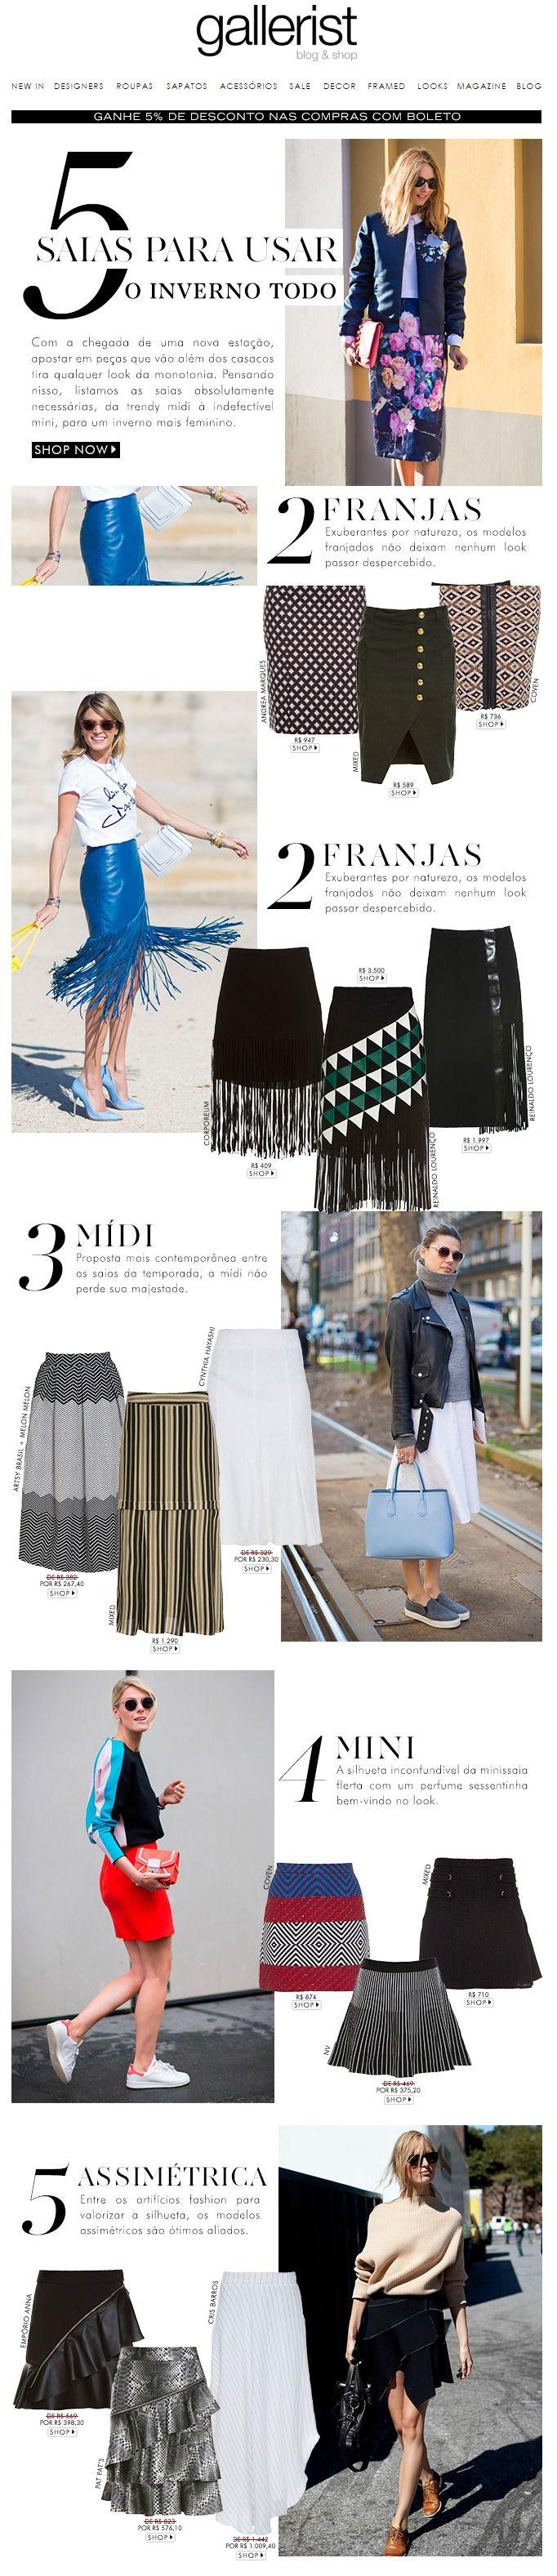 newsletter, saias, gallerist, saias de inverno, fashion news, layout, street style